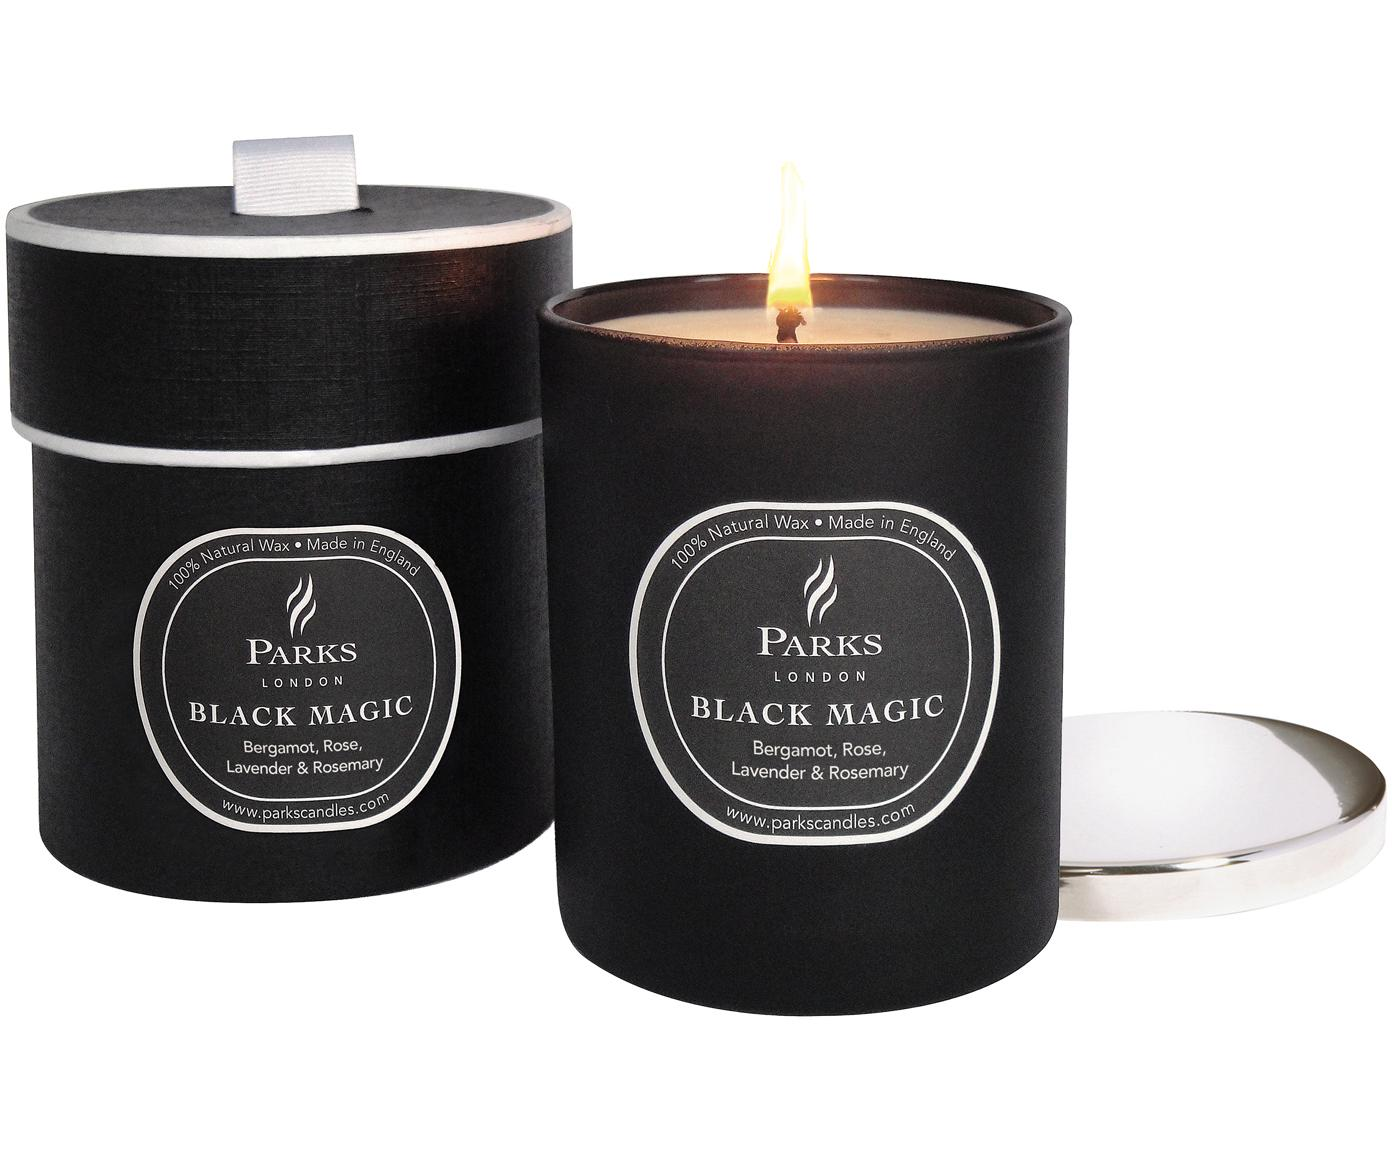 Duftkerze Black Magic (Bergamotte & Rose), Behälter: Glas, Deckel: Metall, Schwarz, Ø 7 x H 9 cm